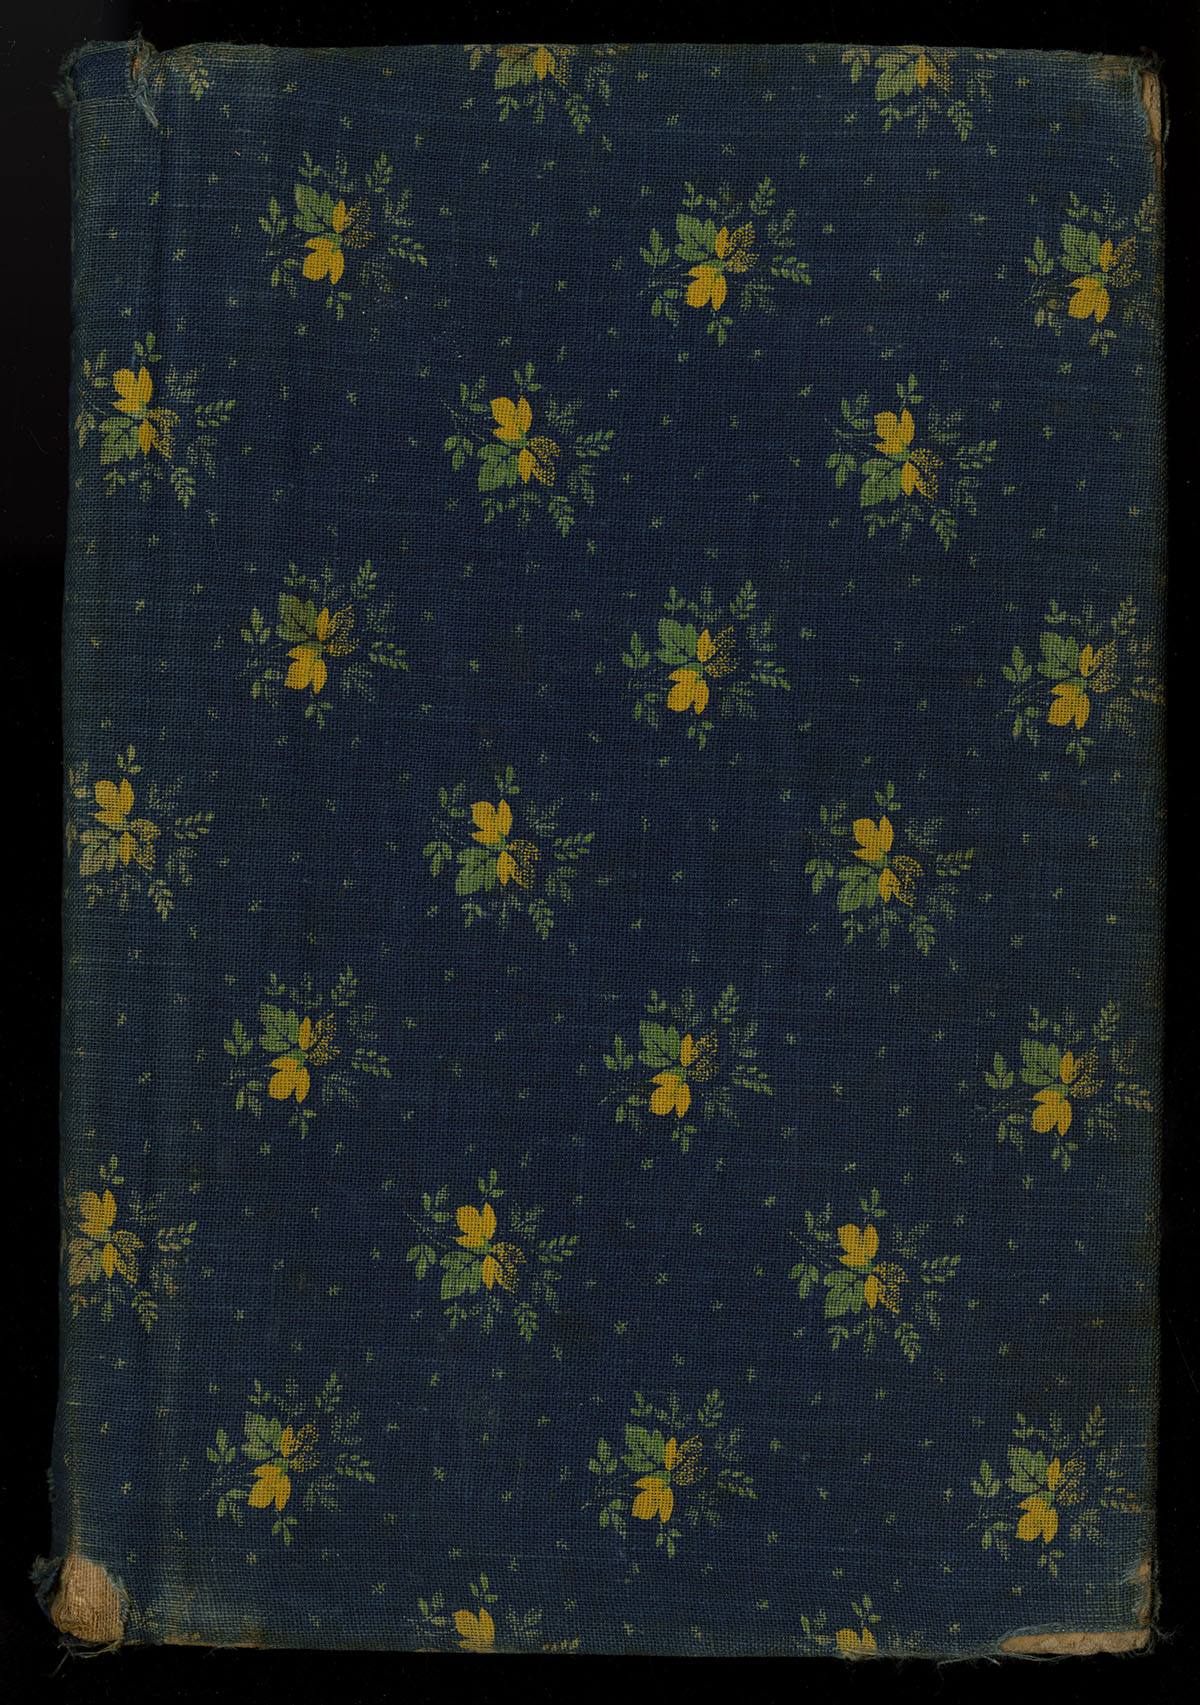 Jacob Groenings, Katholischer Katechismus (New York, 1900). Michael Zinman Binding Collection.